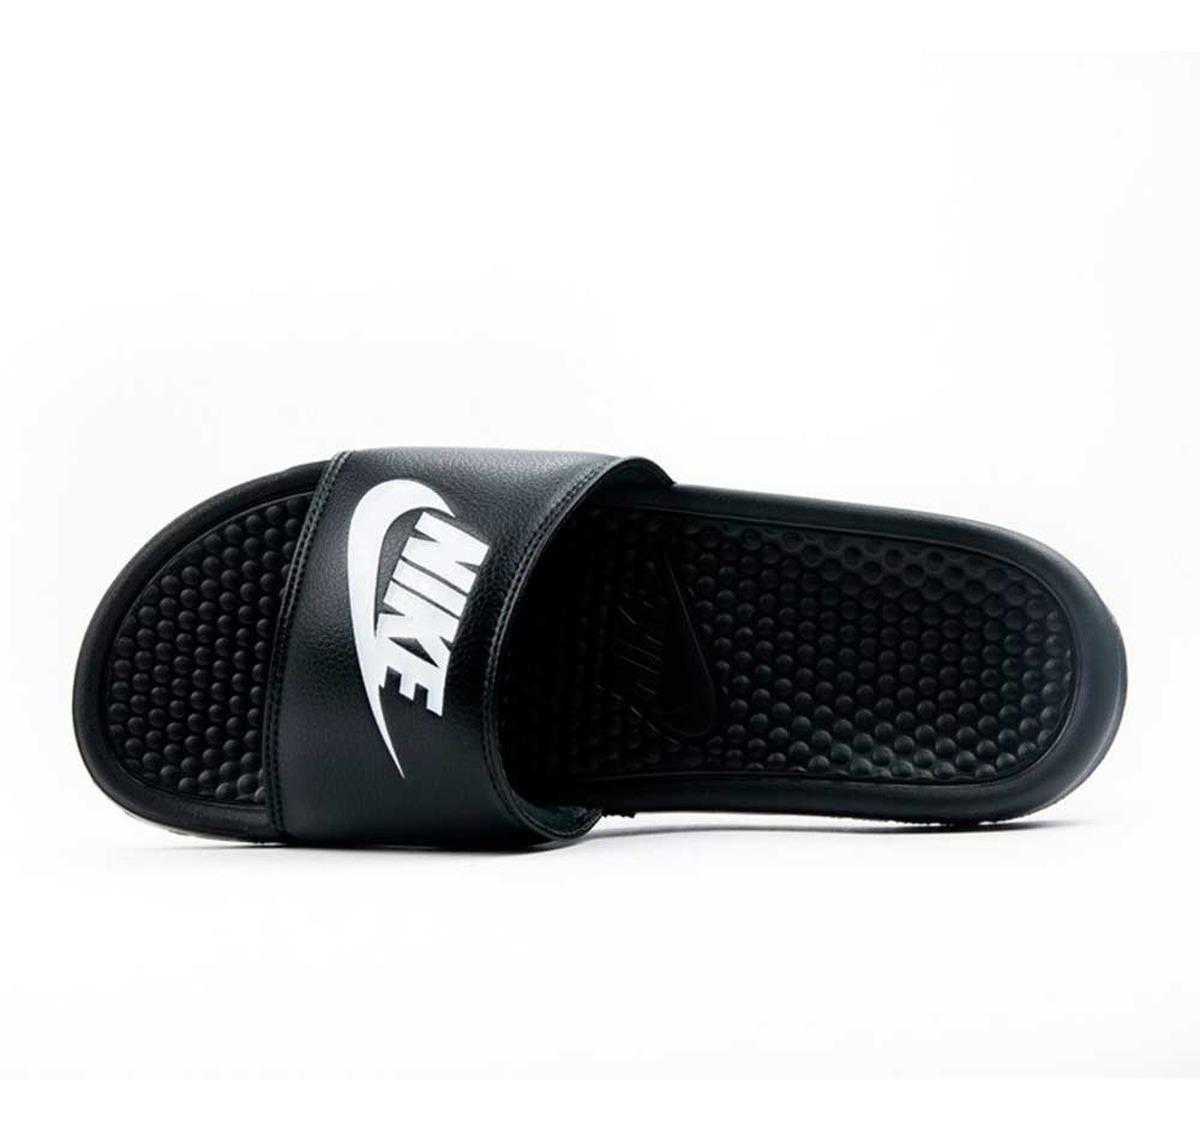 Sandalias Nike Benassi Jdi Para Hombre/ Negro, Blanco Y Azul